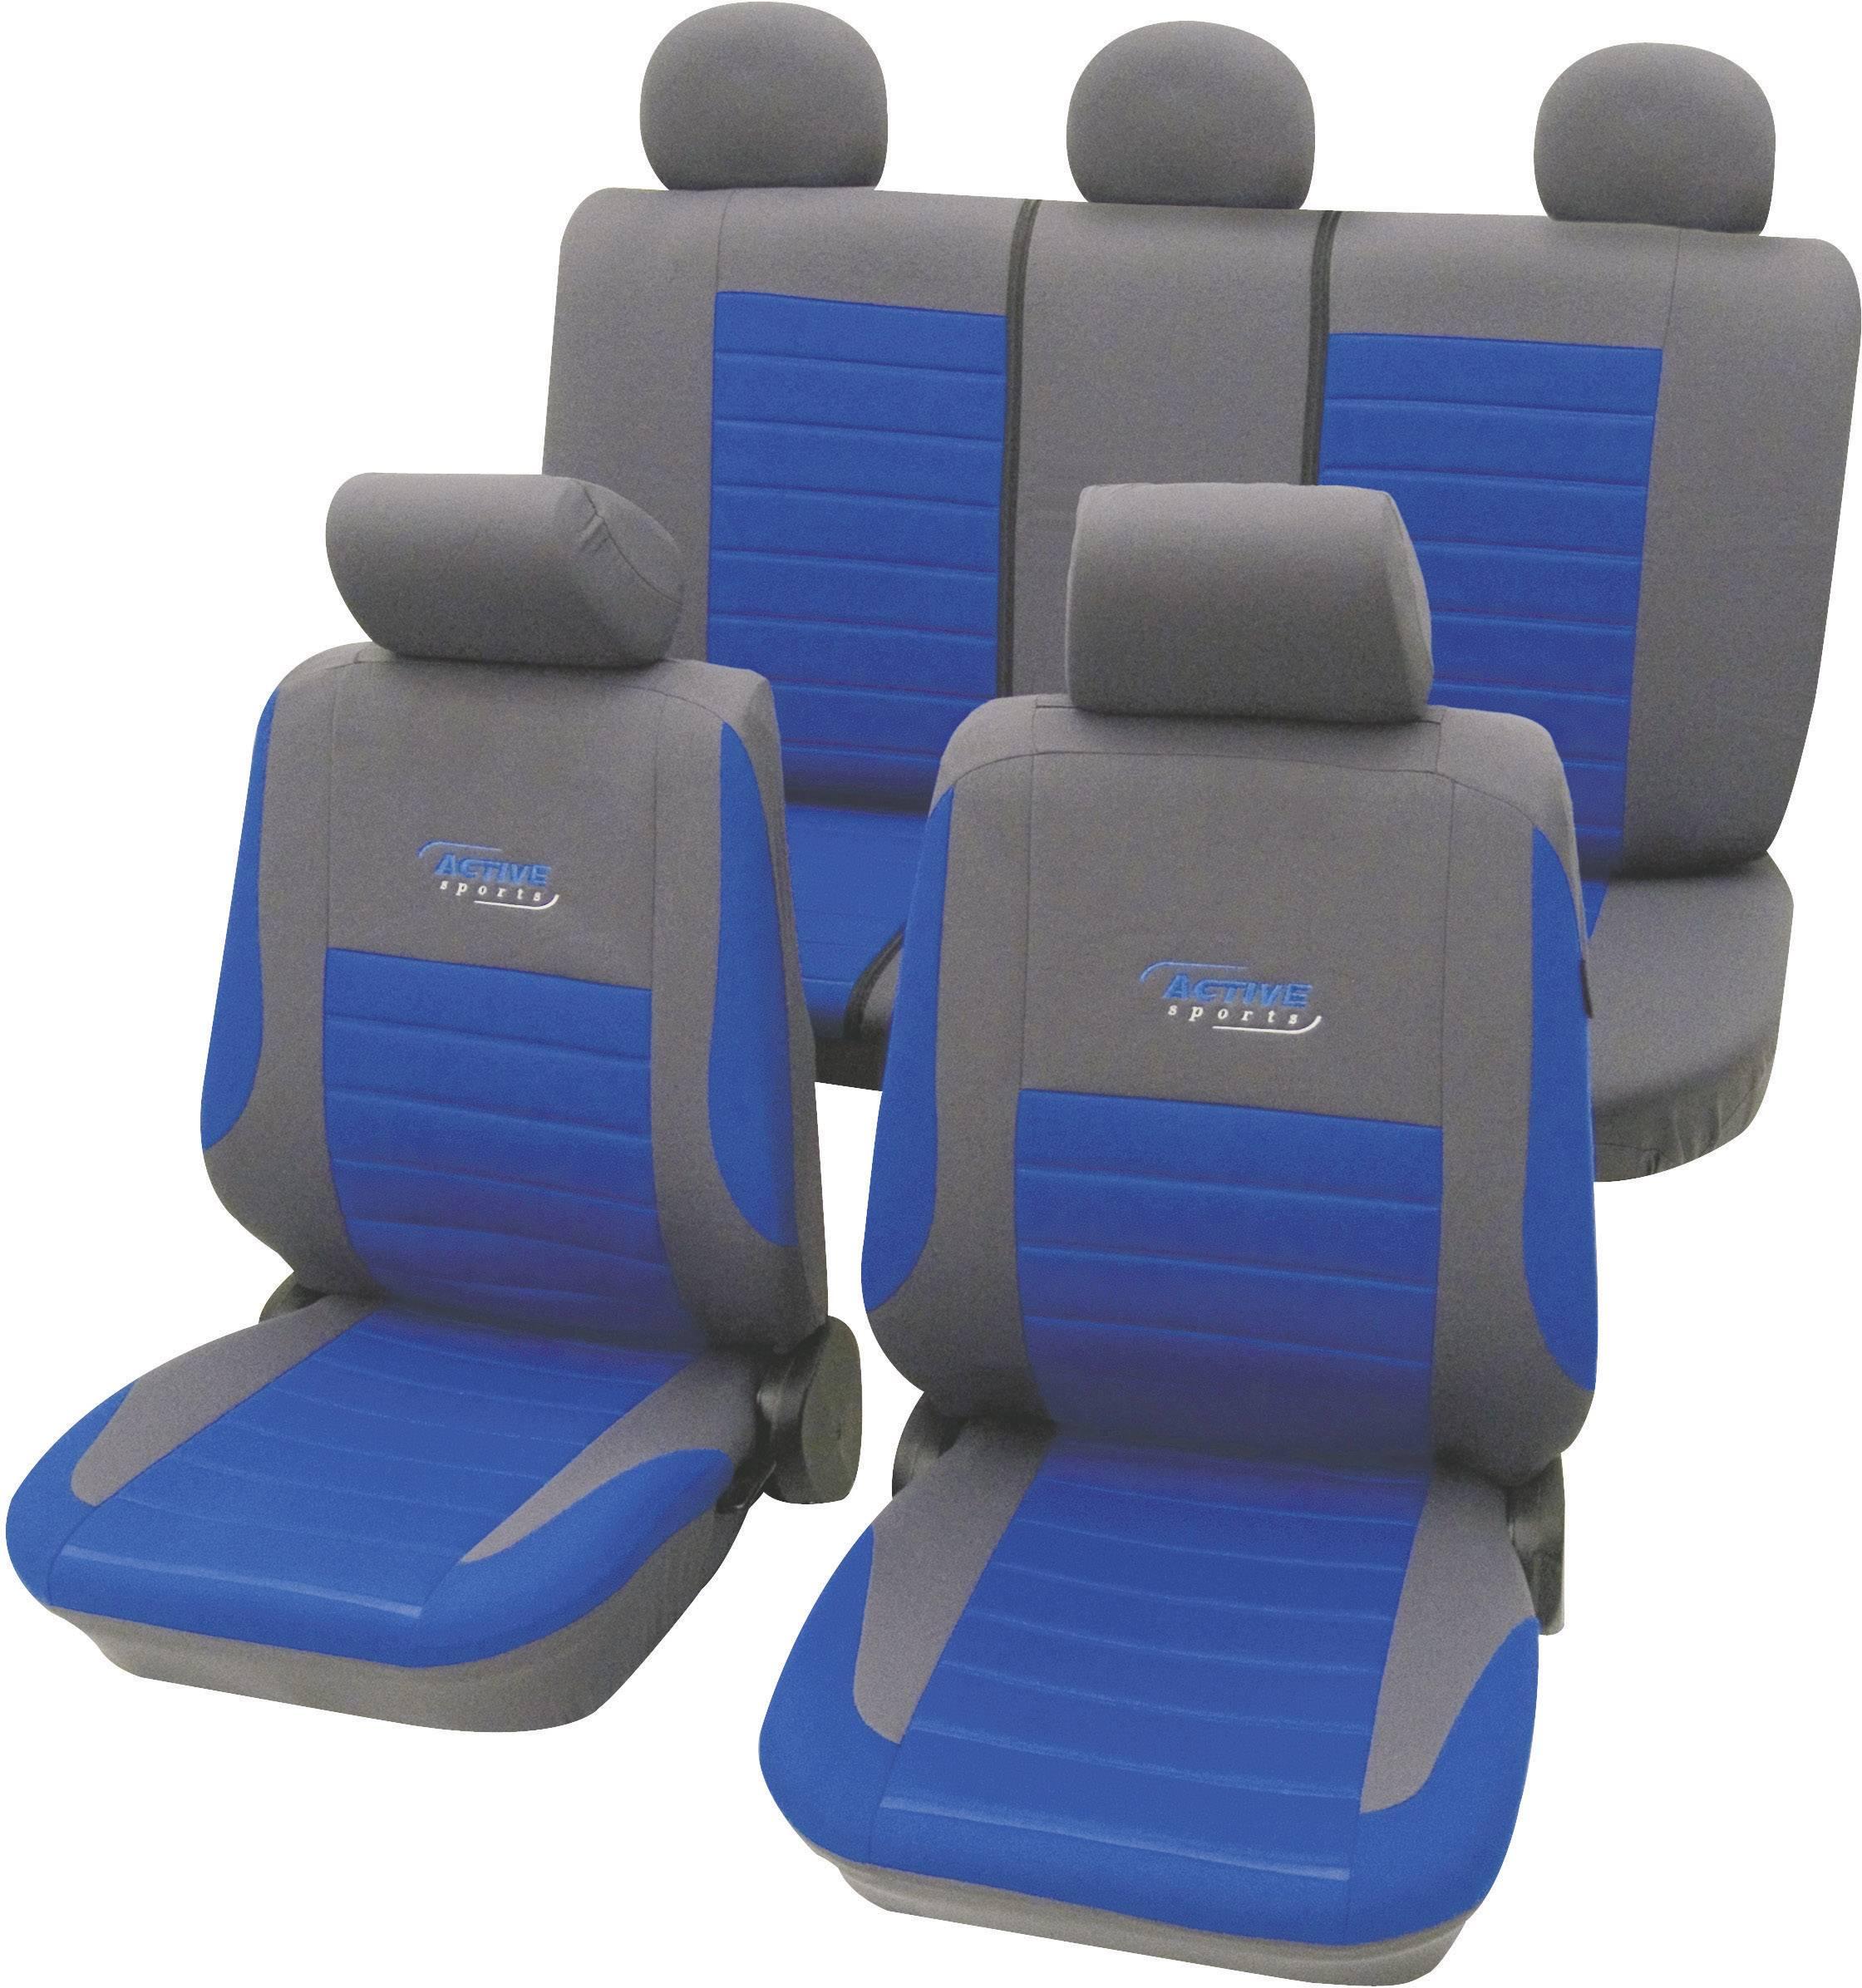 Autopotahy cartrend Active 60120, 11dílná, polyester, modrá